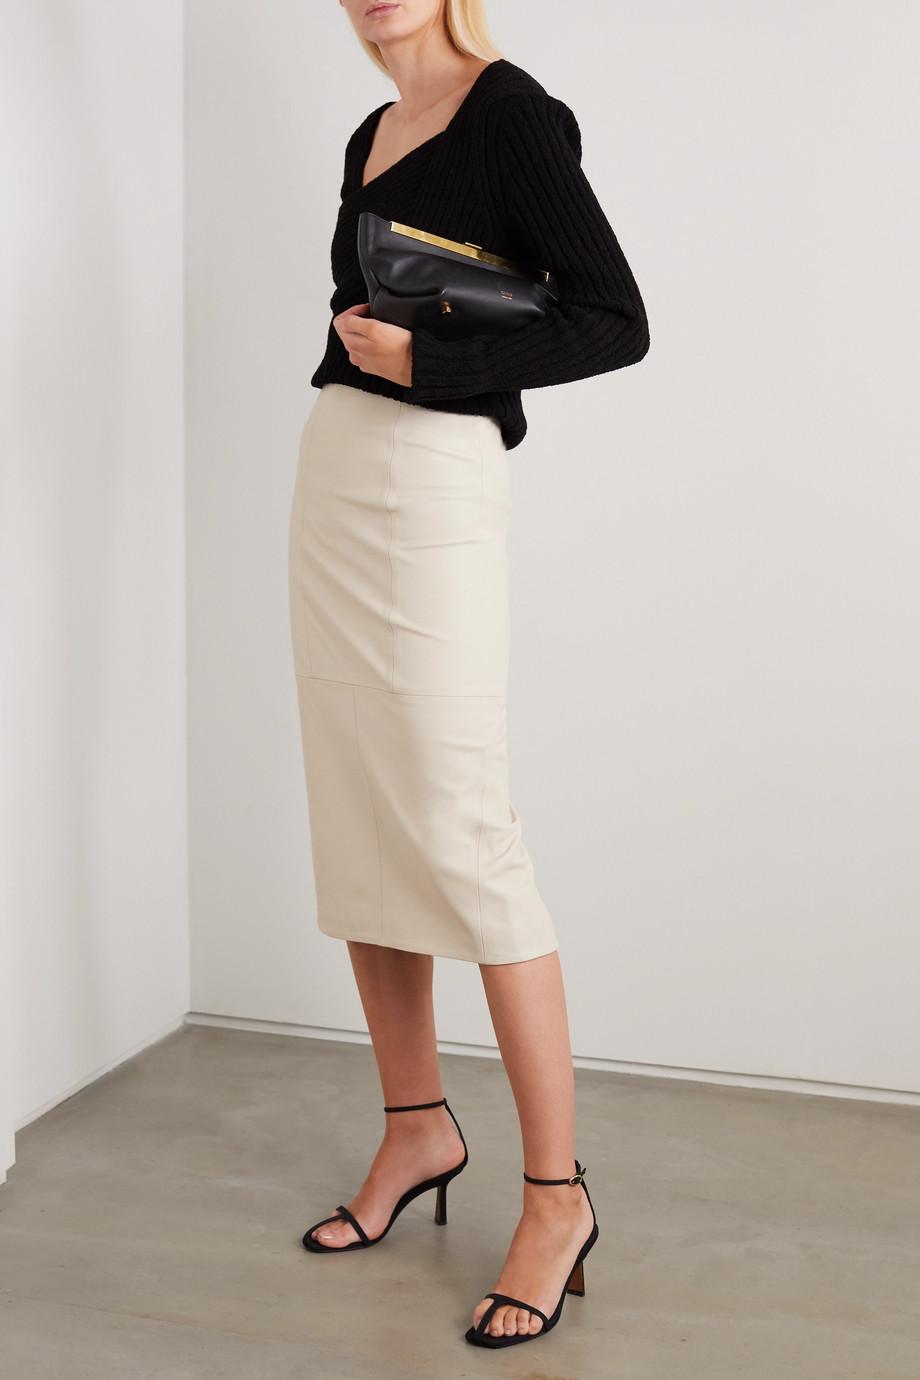 Co Paneled leather midi skirt